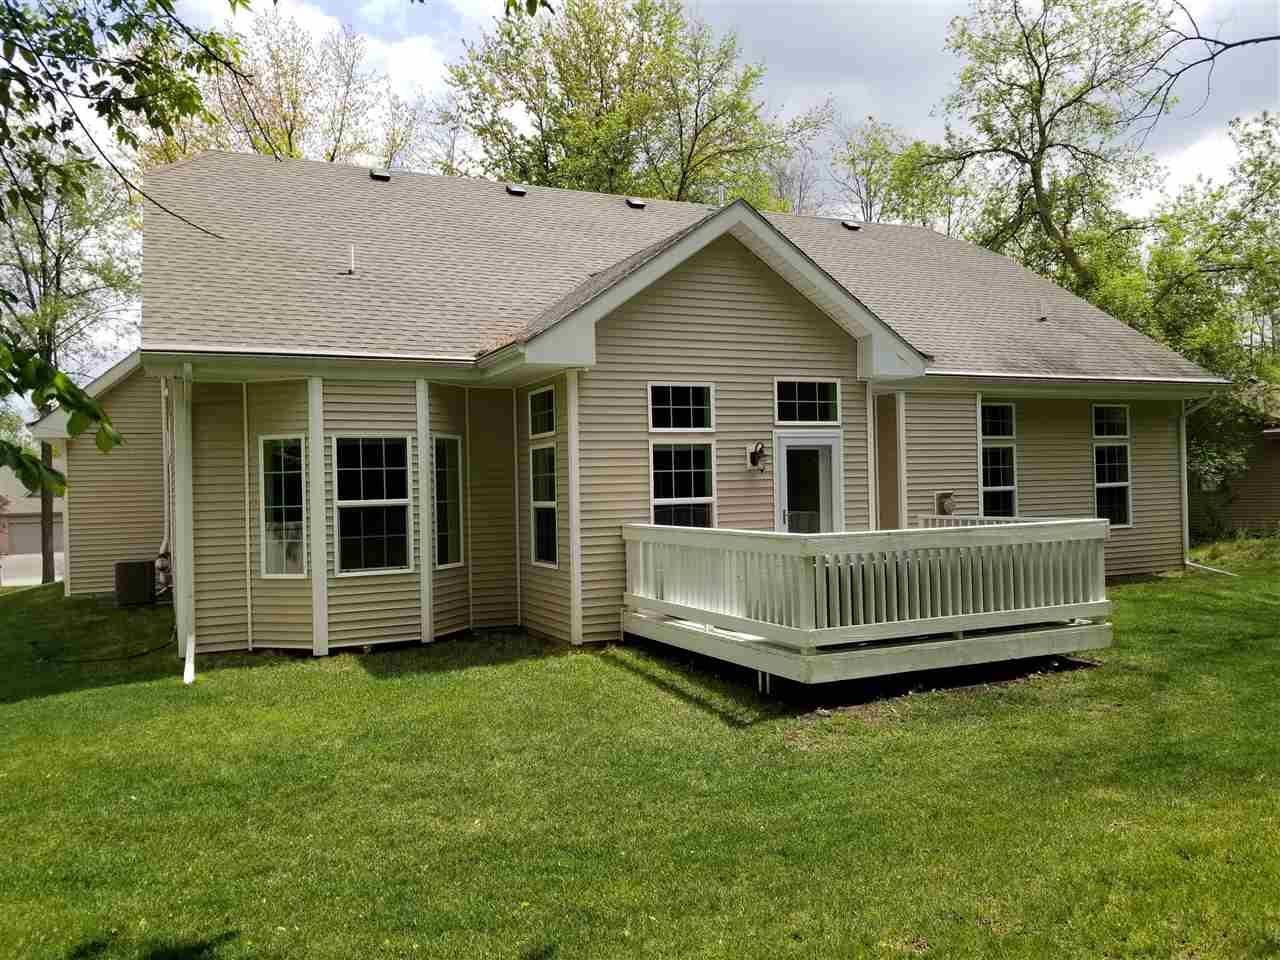 f_1909271_01 Real Estate in 53534 zip code